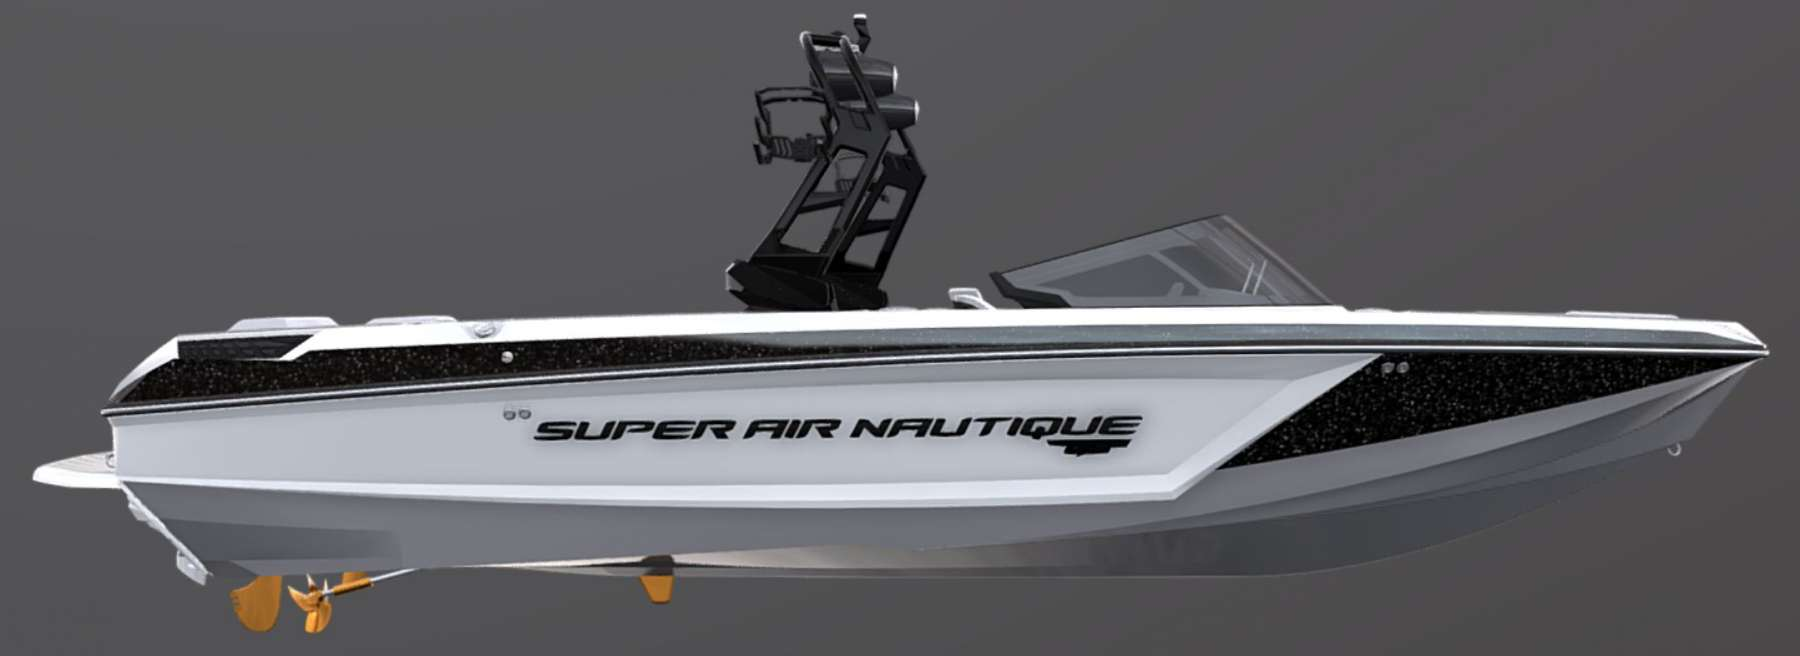 2021-Nautique-GS24-Jet-Black-Metal-Flake-Tungsten-Grey-Wake-Boat-2